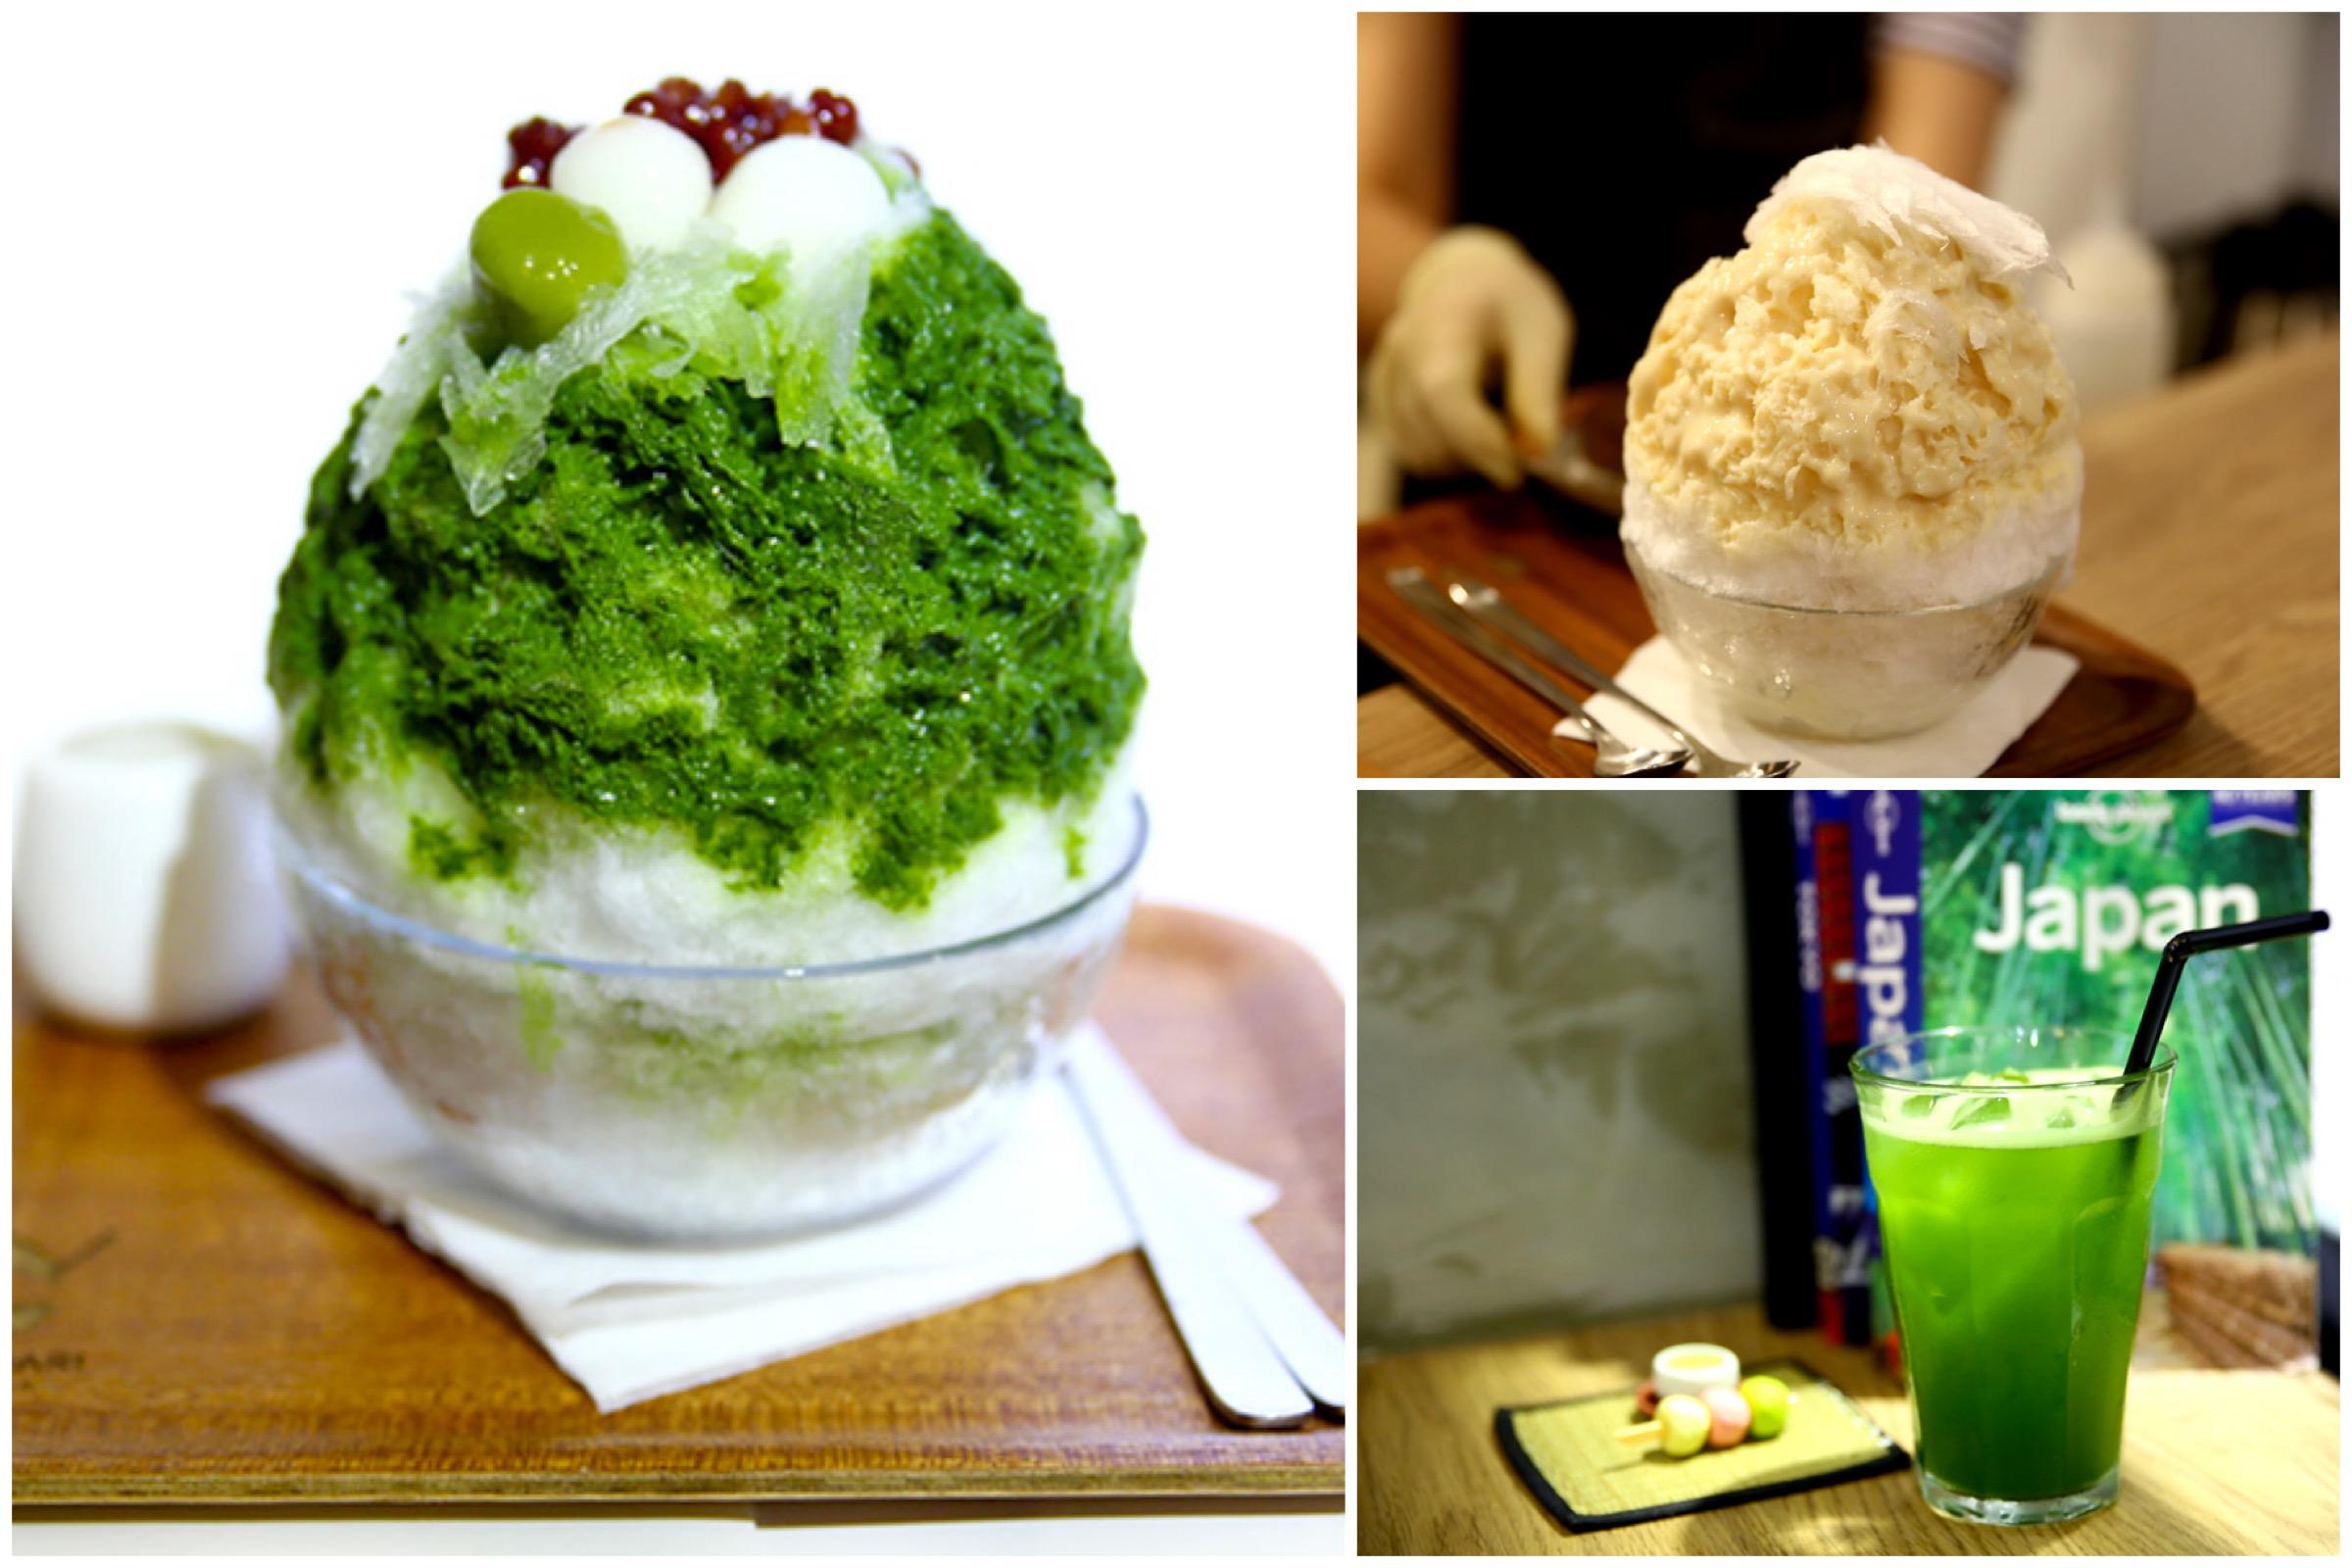 SHARI SHARI Kakigori House 氷屋 – Popular Japanese Shaved Ice Kakigori Cafe, At Causeway Bay Hong Kong